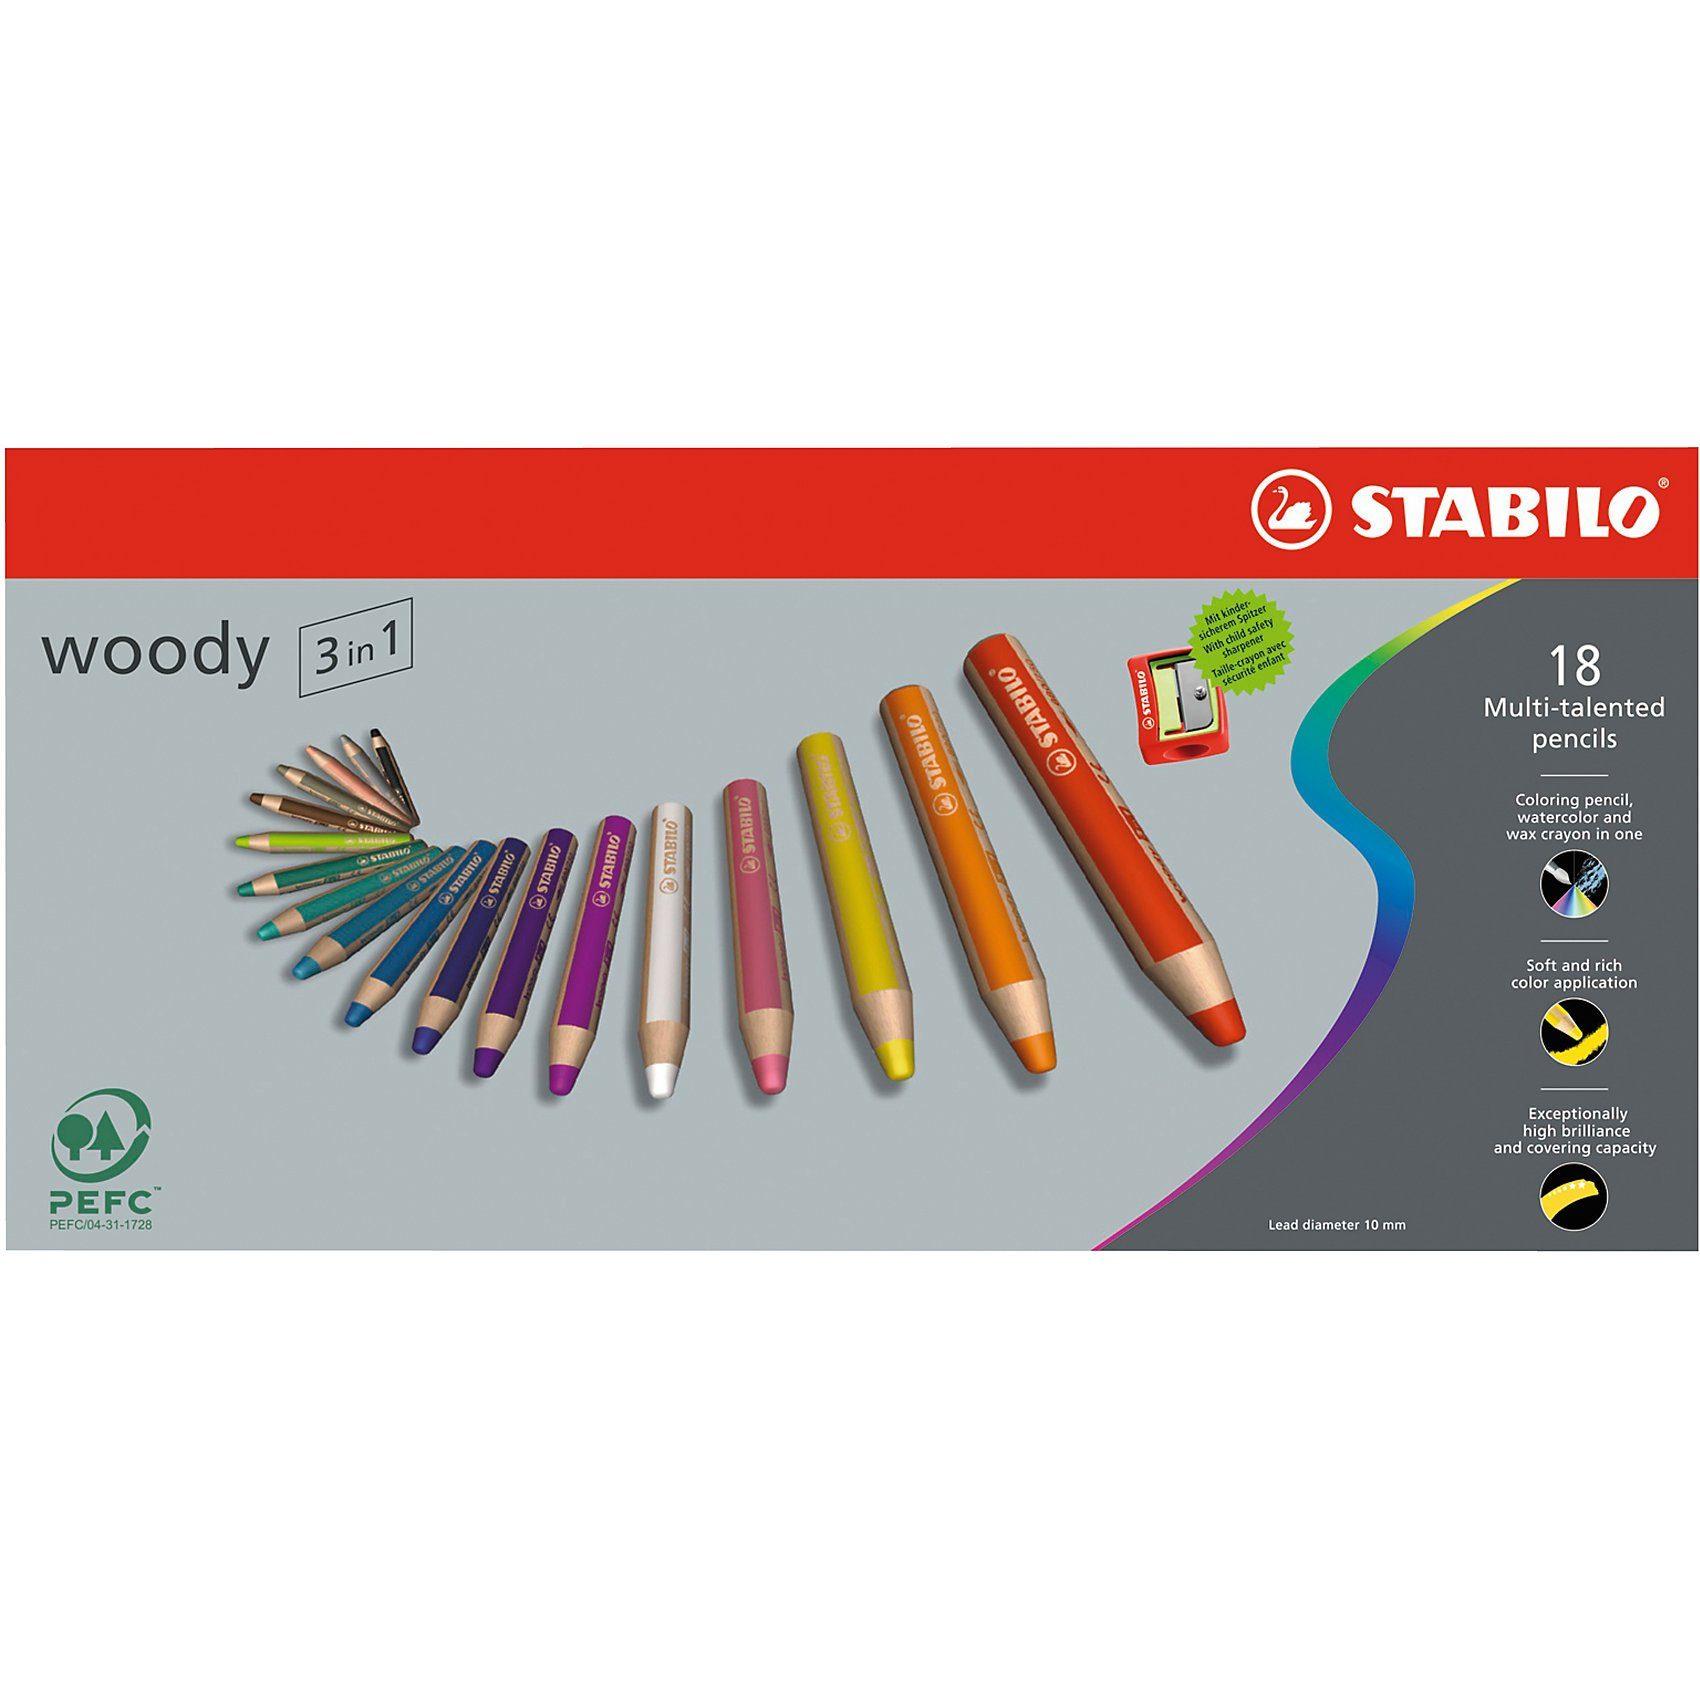 Stabilo Buntstift woody 3 in 1, 18 Farben